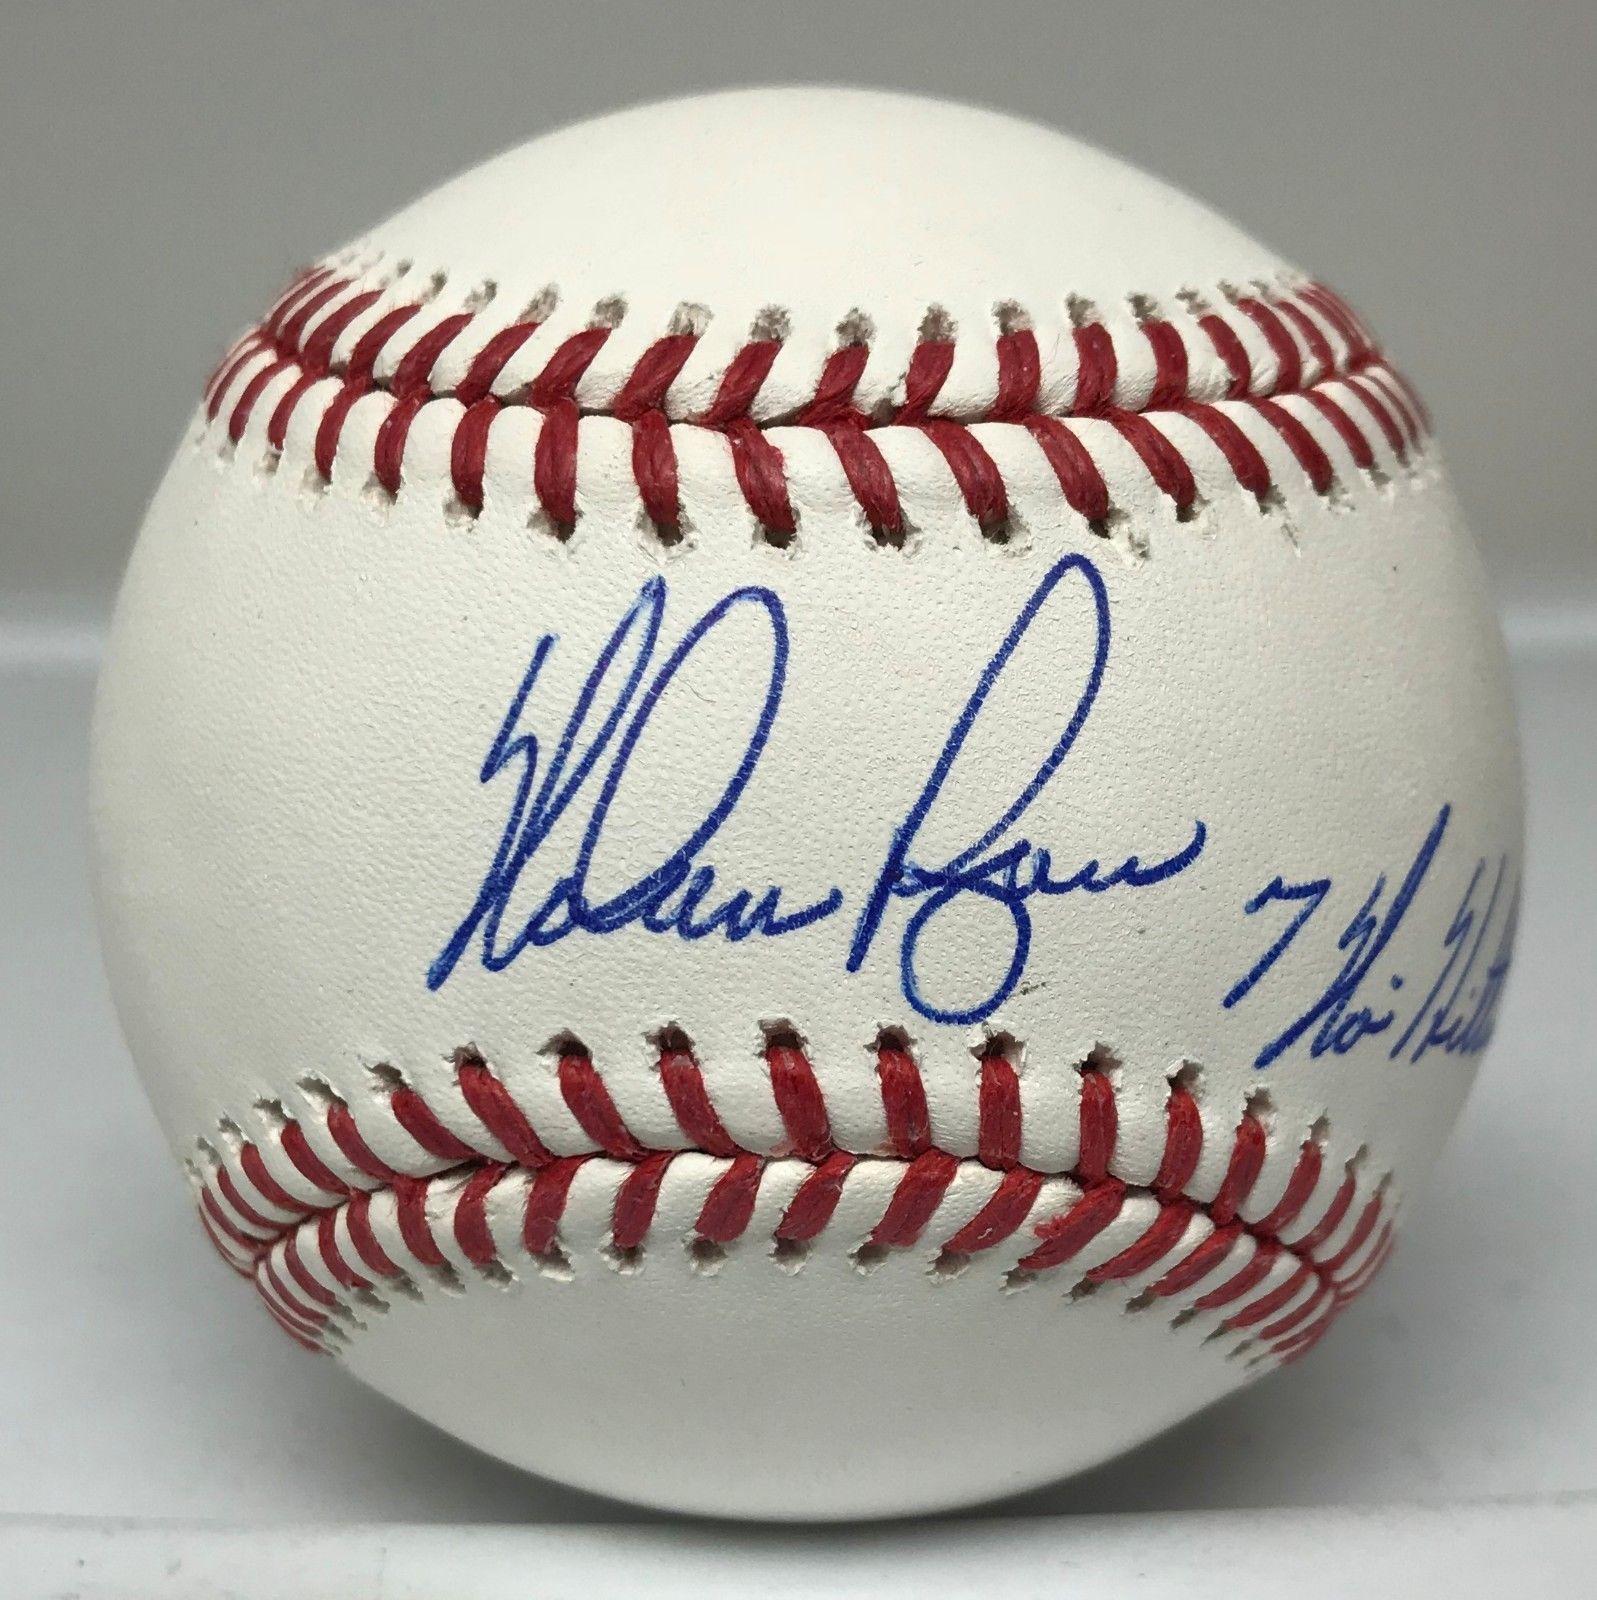 Nolan Ryan 7 No Hitters Signed Baseball Autographed Auto W Hologram Mets Hof Baseball Autographed Baseballs Nolan Ryan Baseball Memorabilia